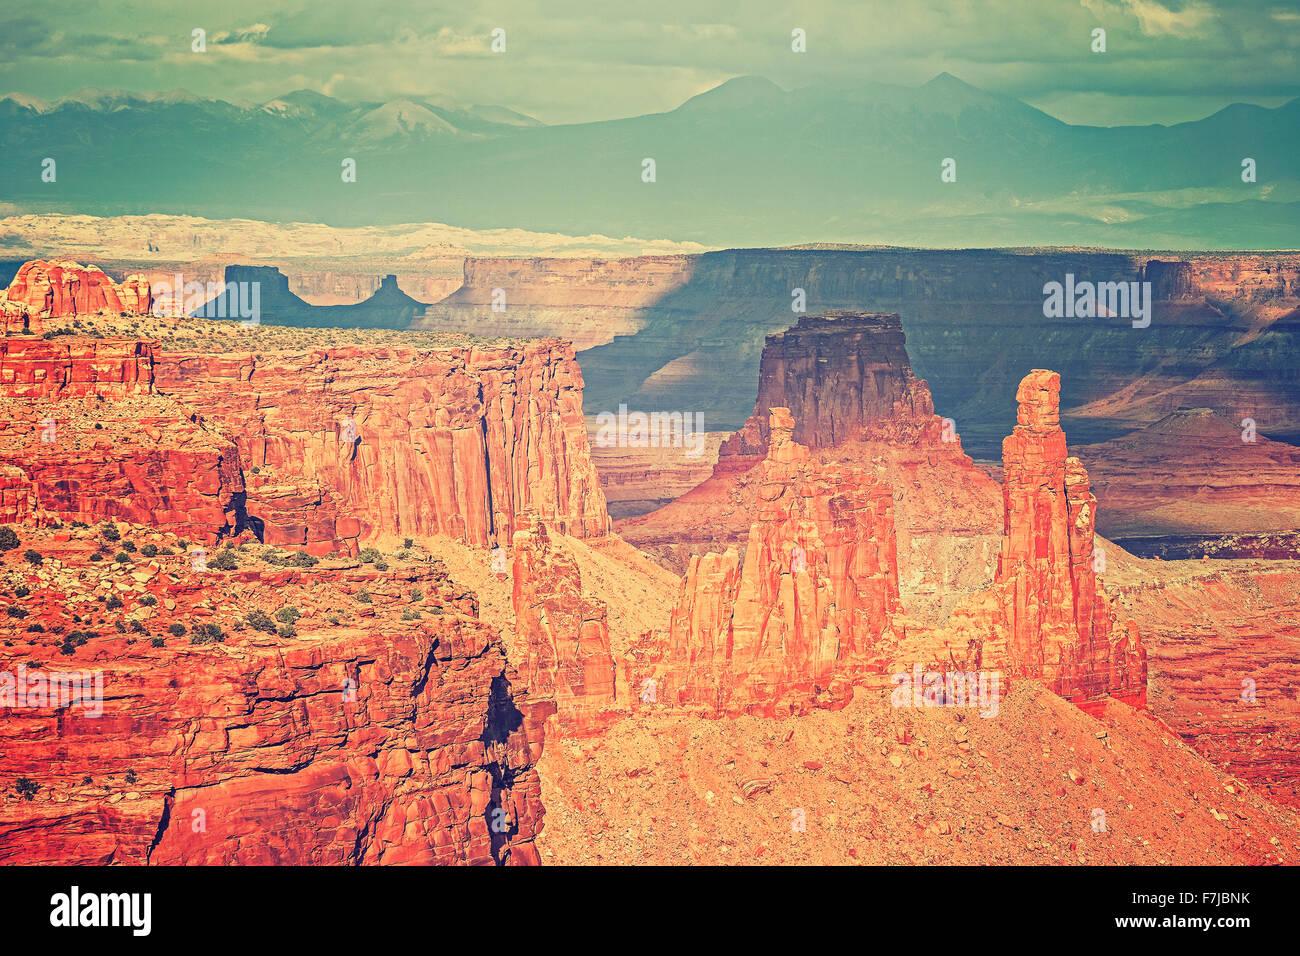 Berglandschaft mit roten Canyon, Utah, USA. Stockbild